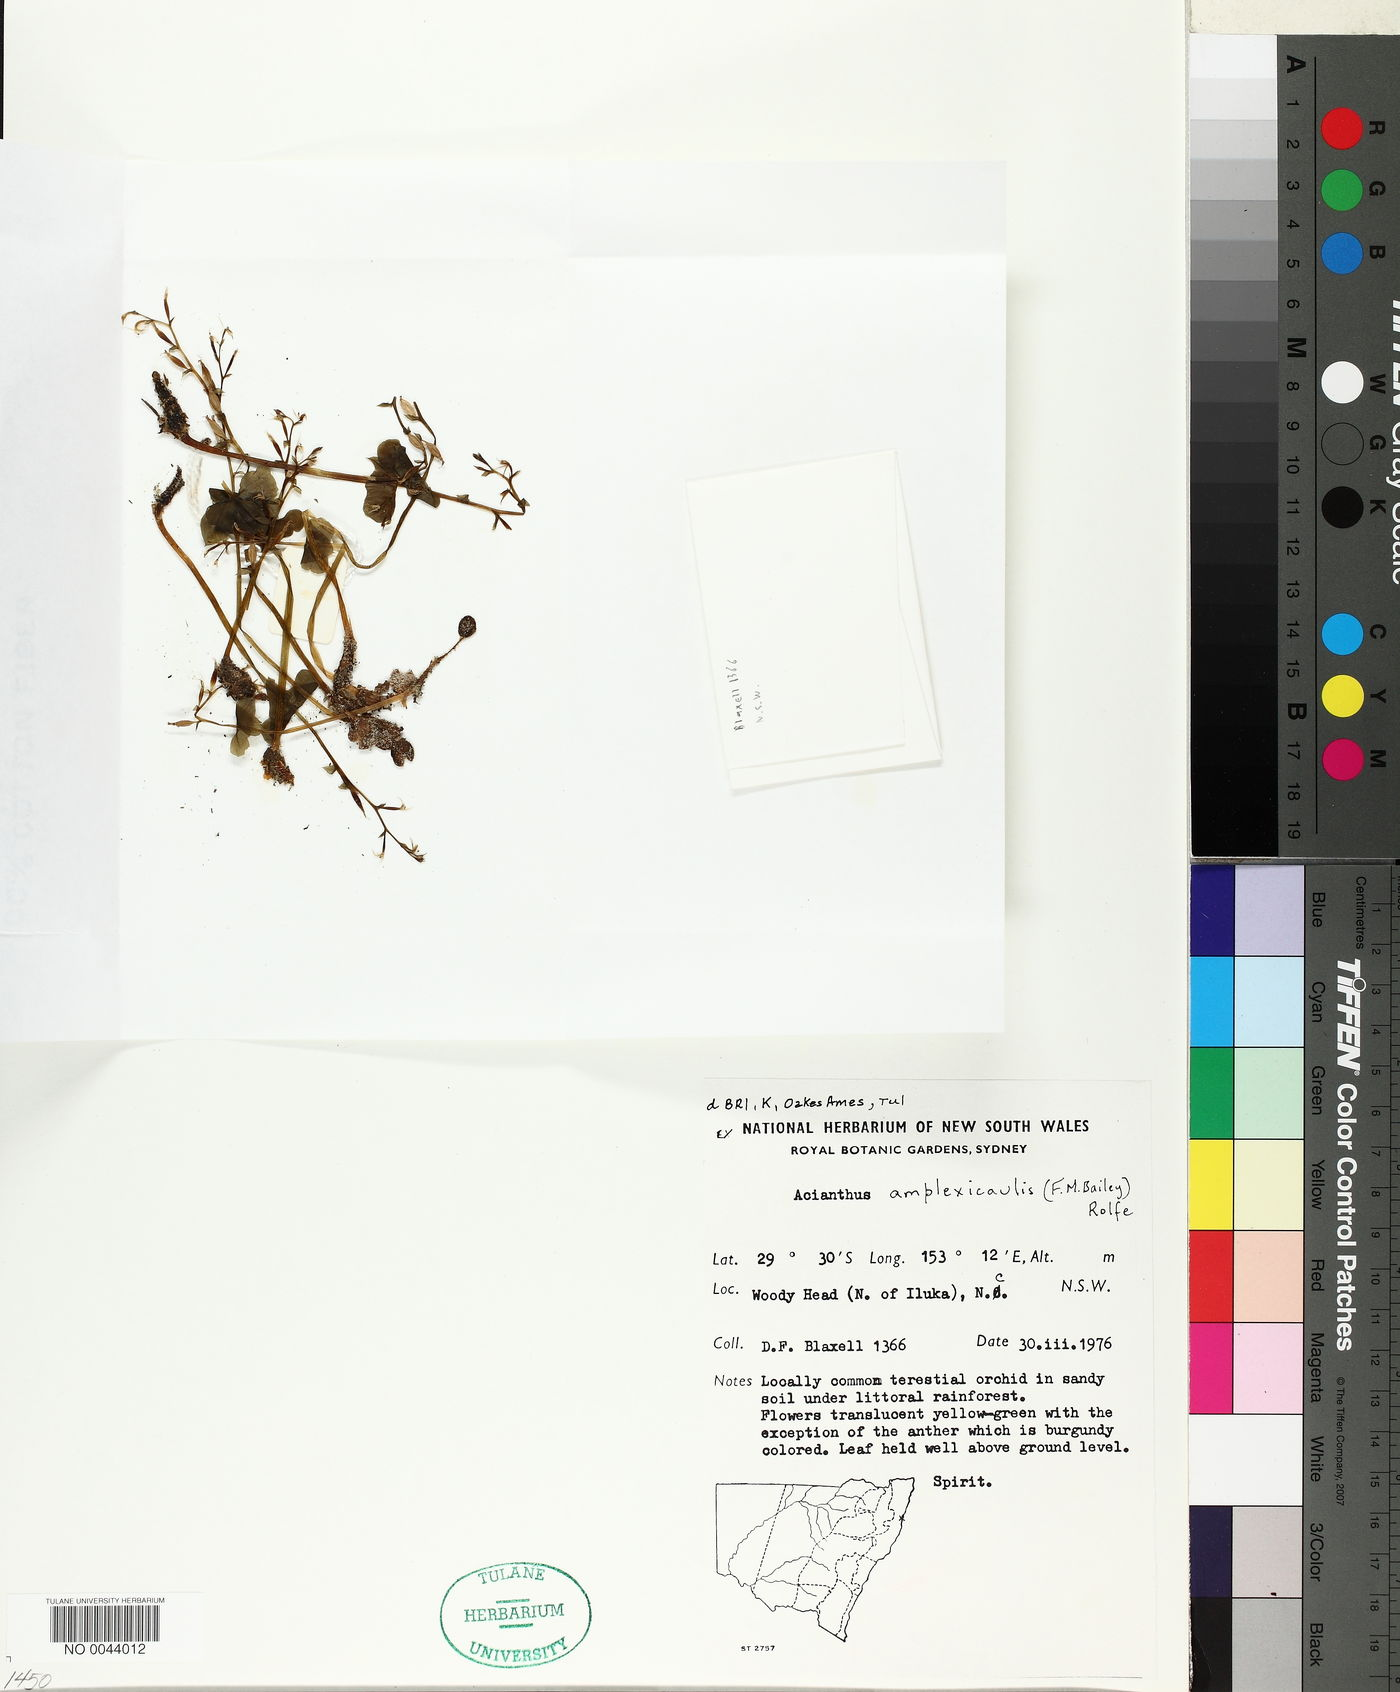 Acianthus amplexicaulis image